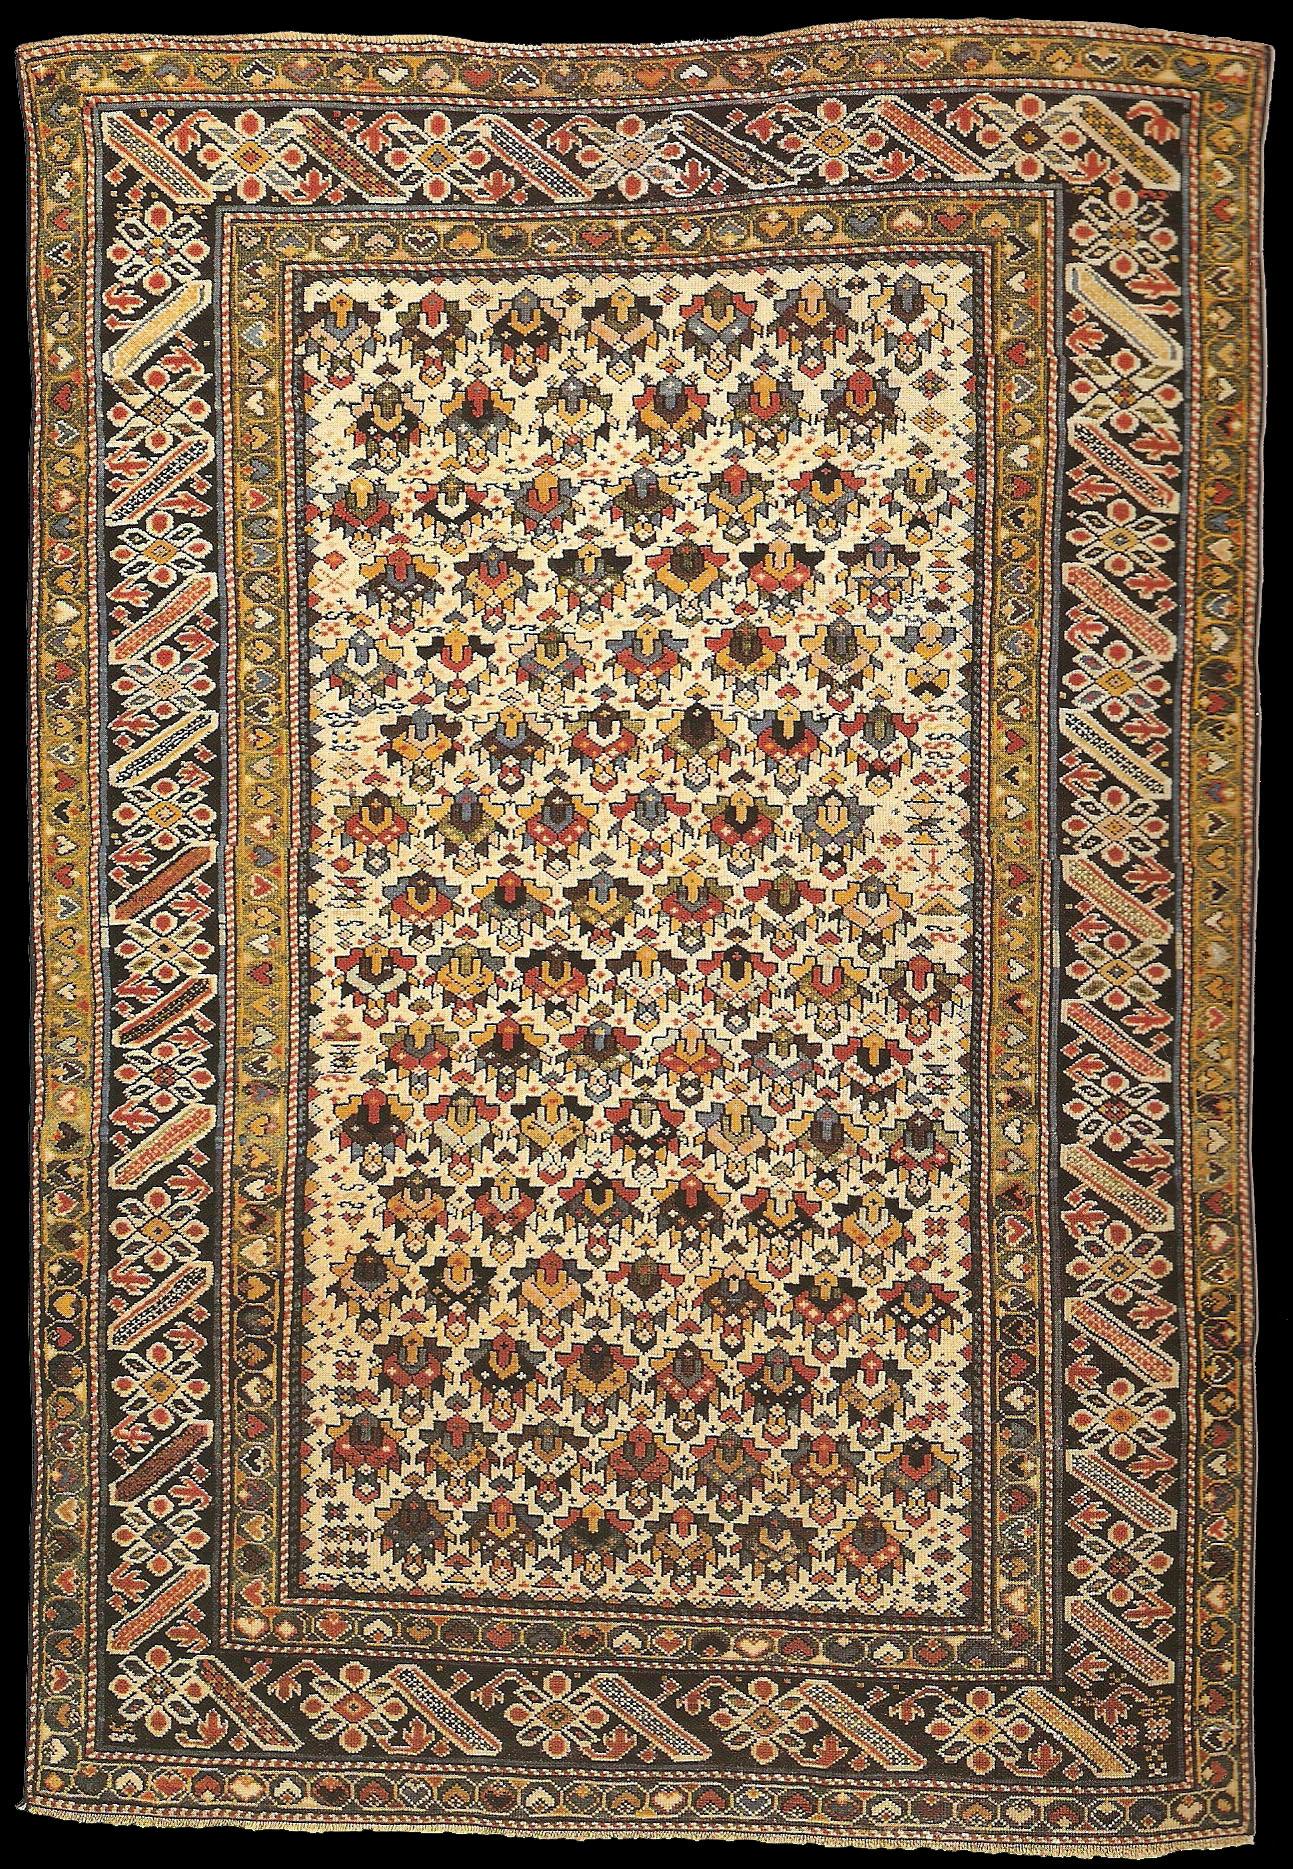 Antique Caucasian Kuba Tschi Tschi carpet, second half of ...